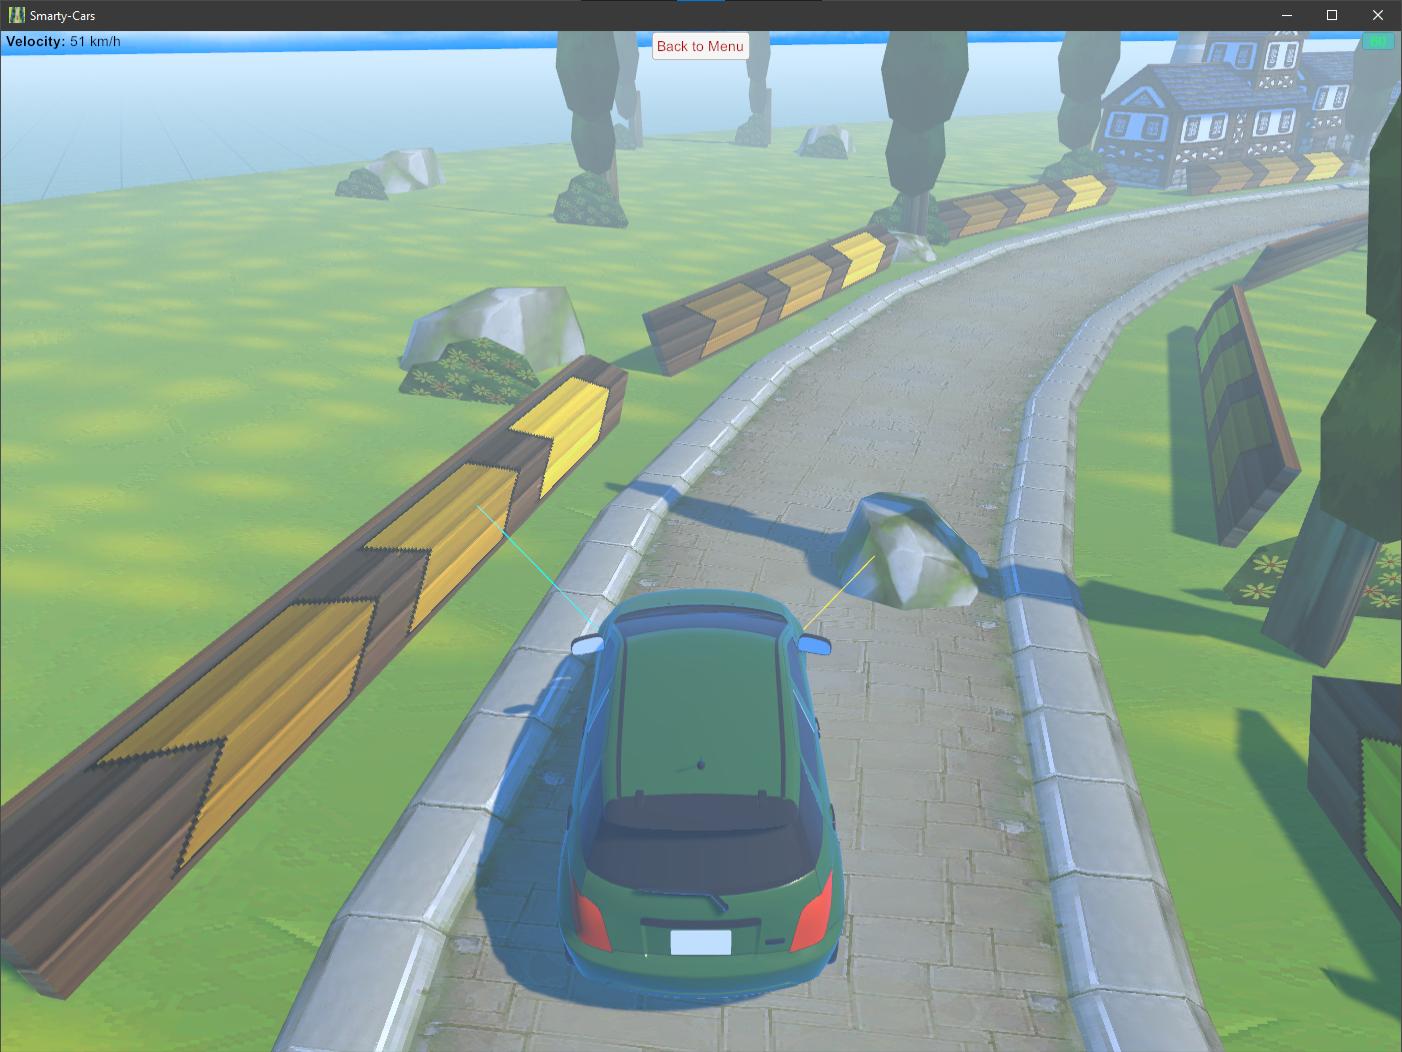 Smarty-Cars Steering Behaviour